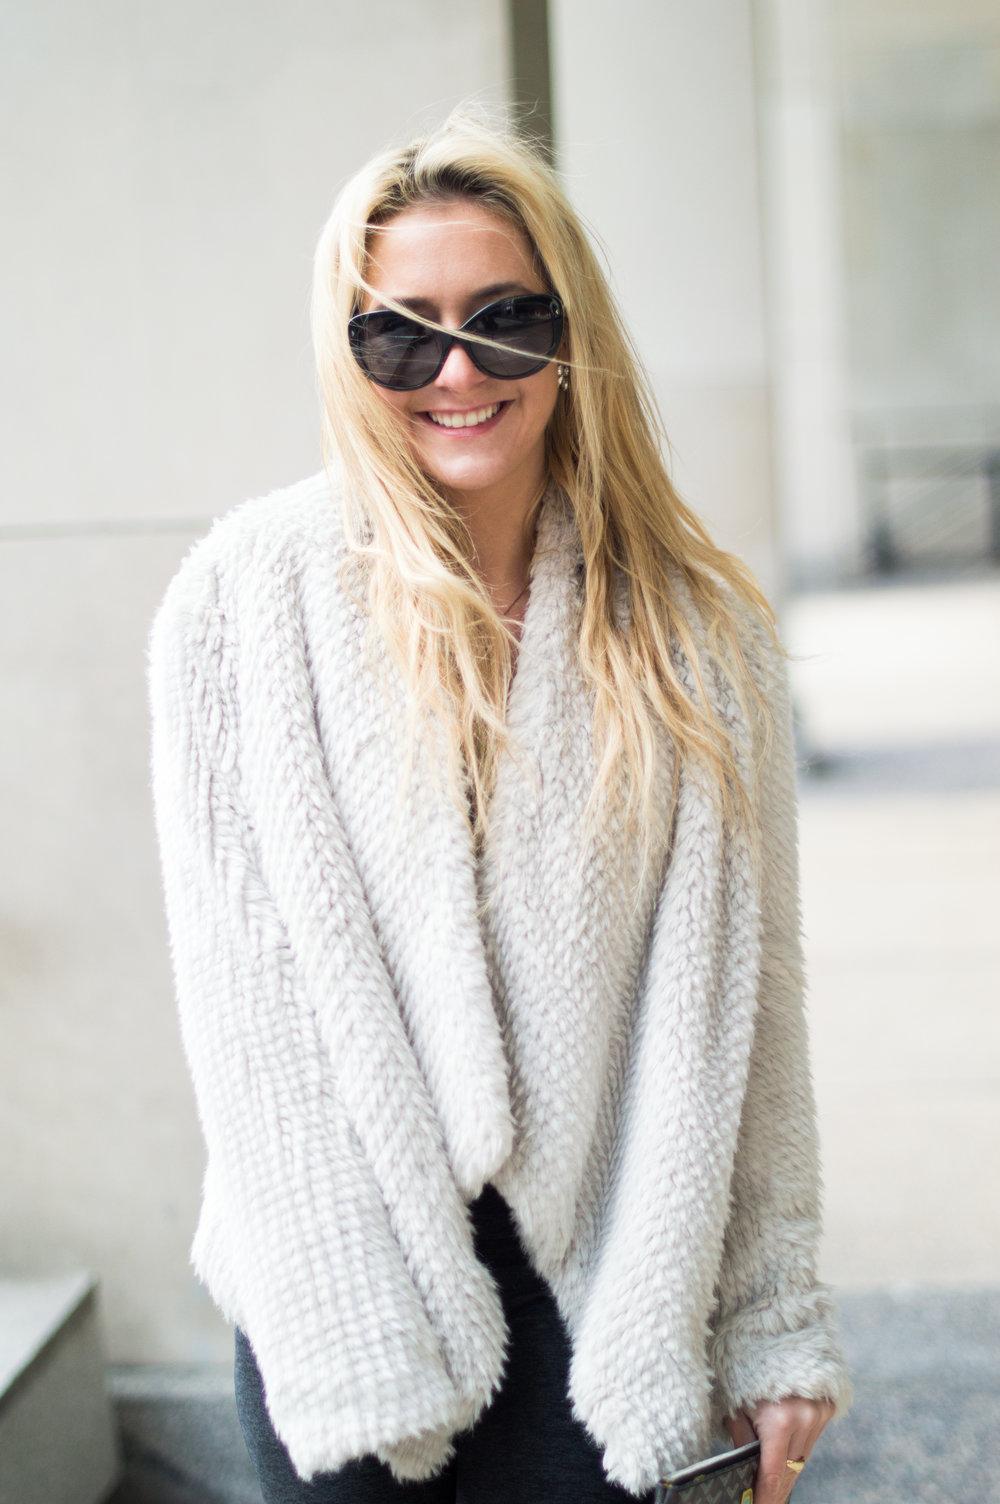 Jacket: Bardot, Sunglasses: Prada